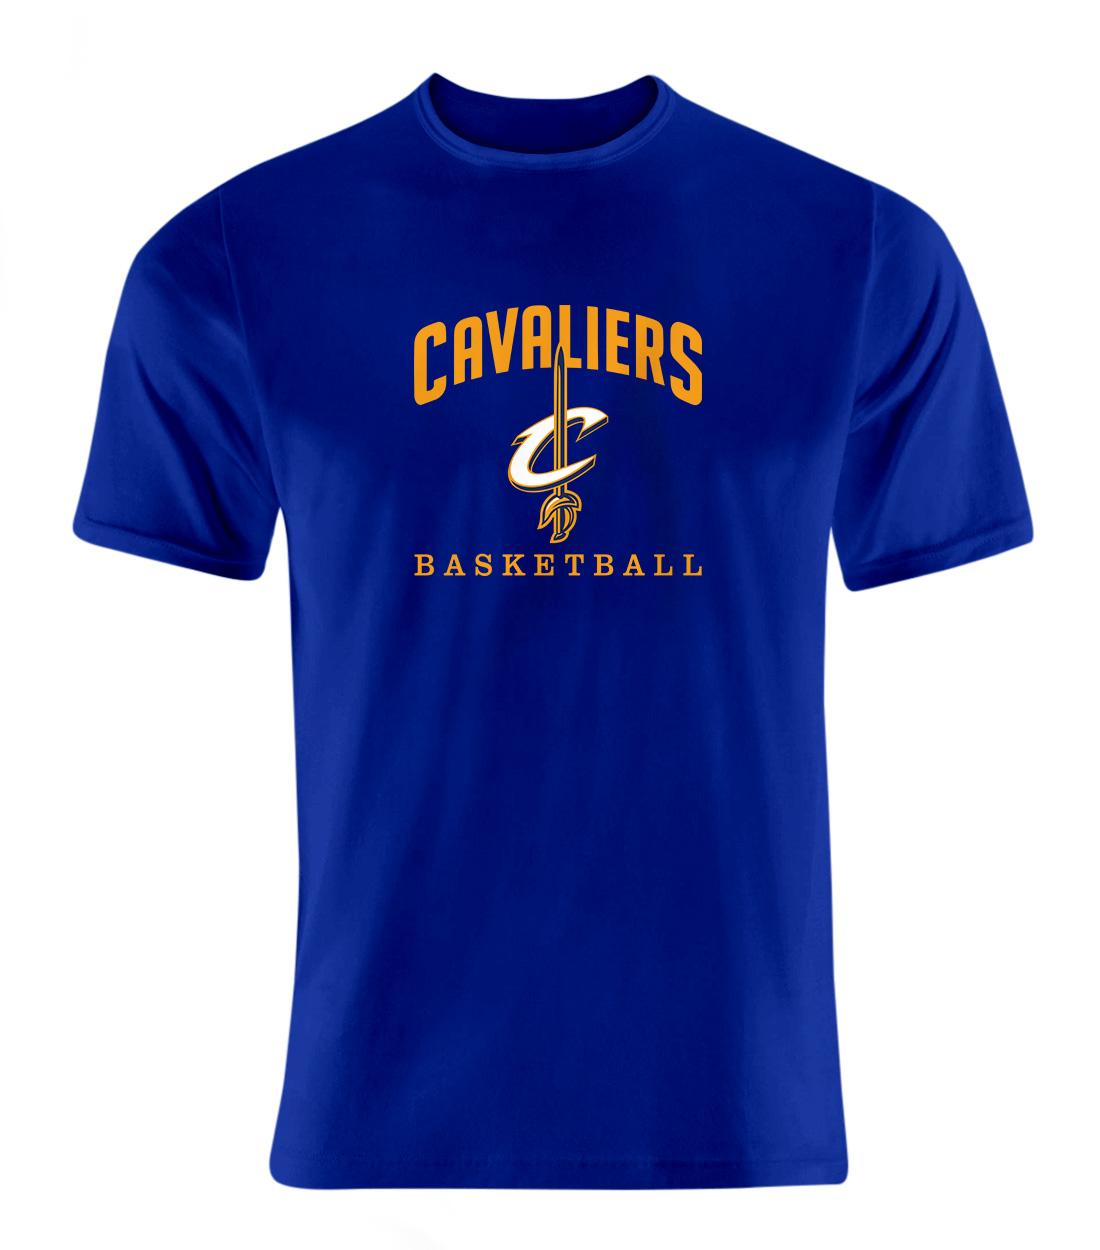 Cleveland Cavaliers Tshirt (TSH-BLU-NP-61-NBA-CLE-CAVS.ARCH)